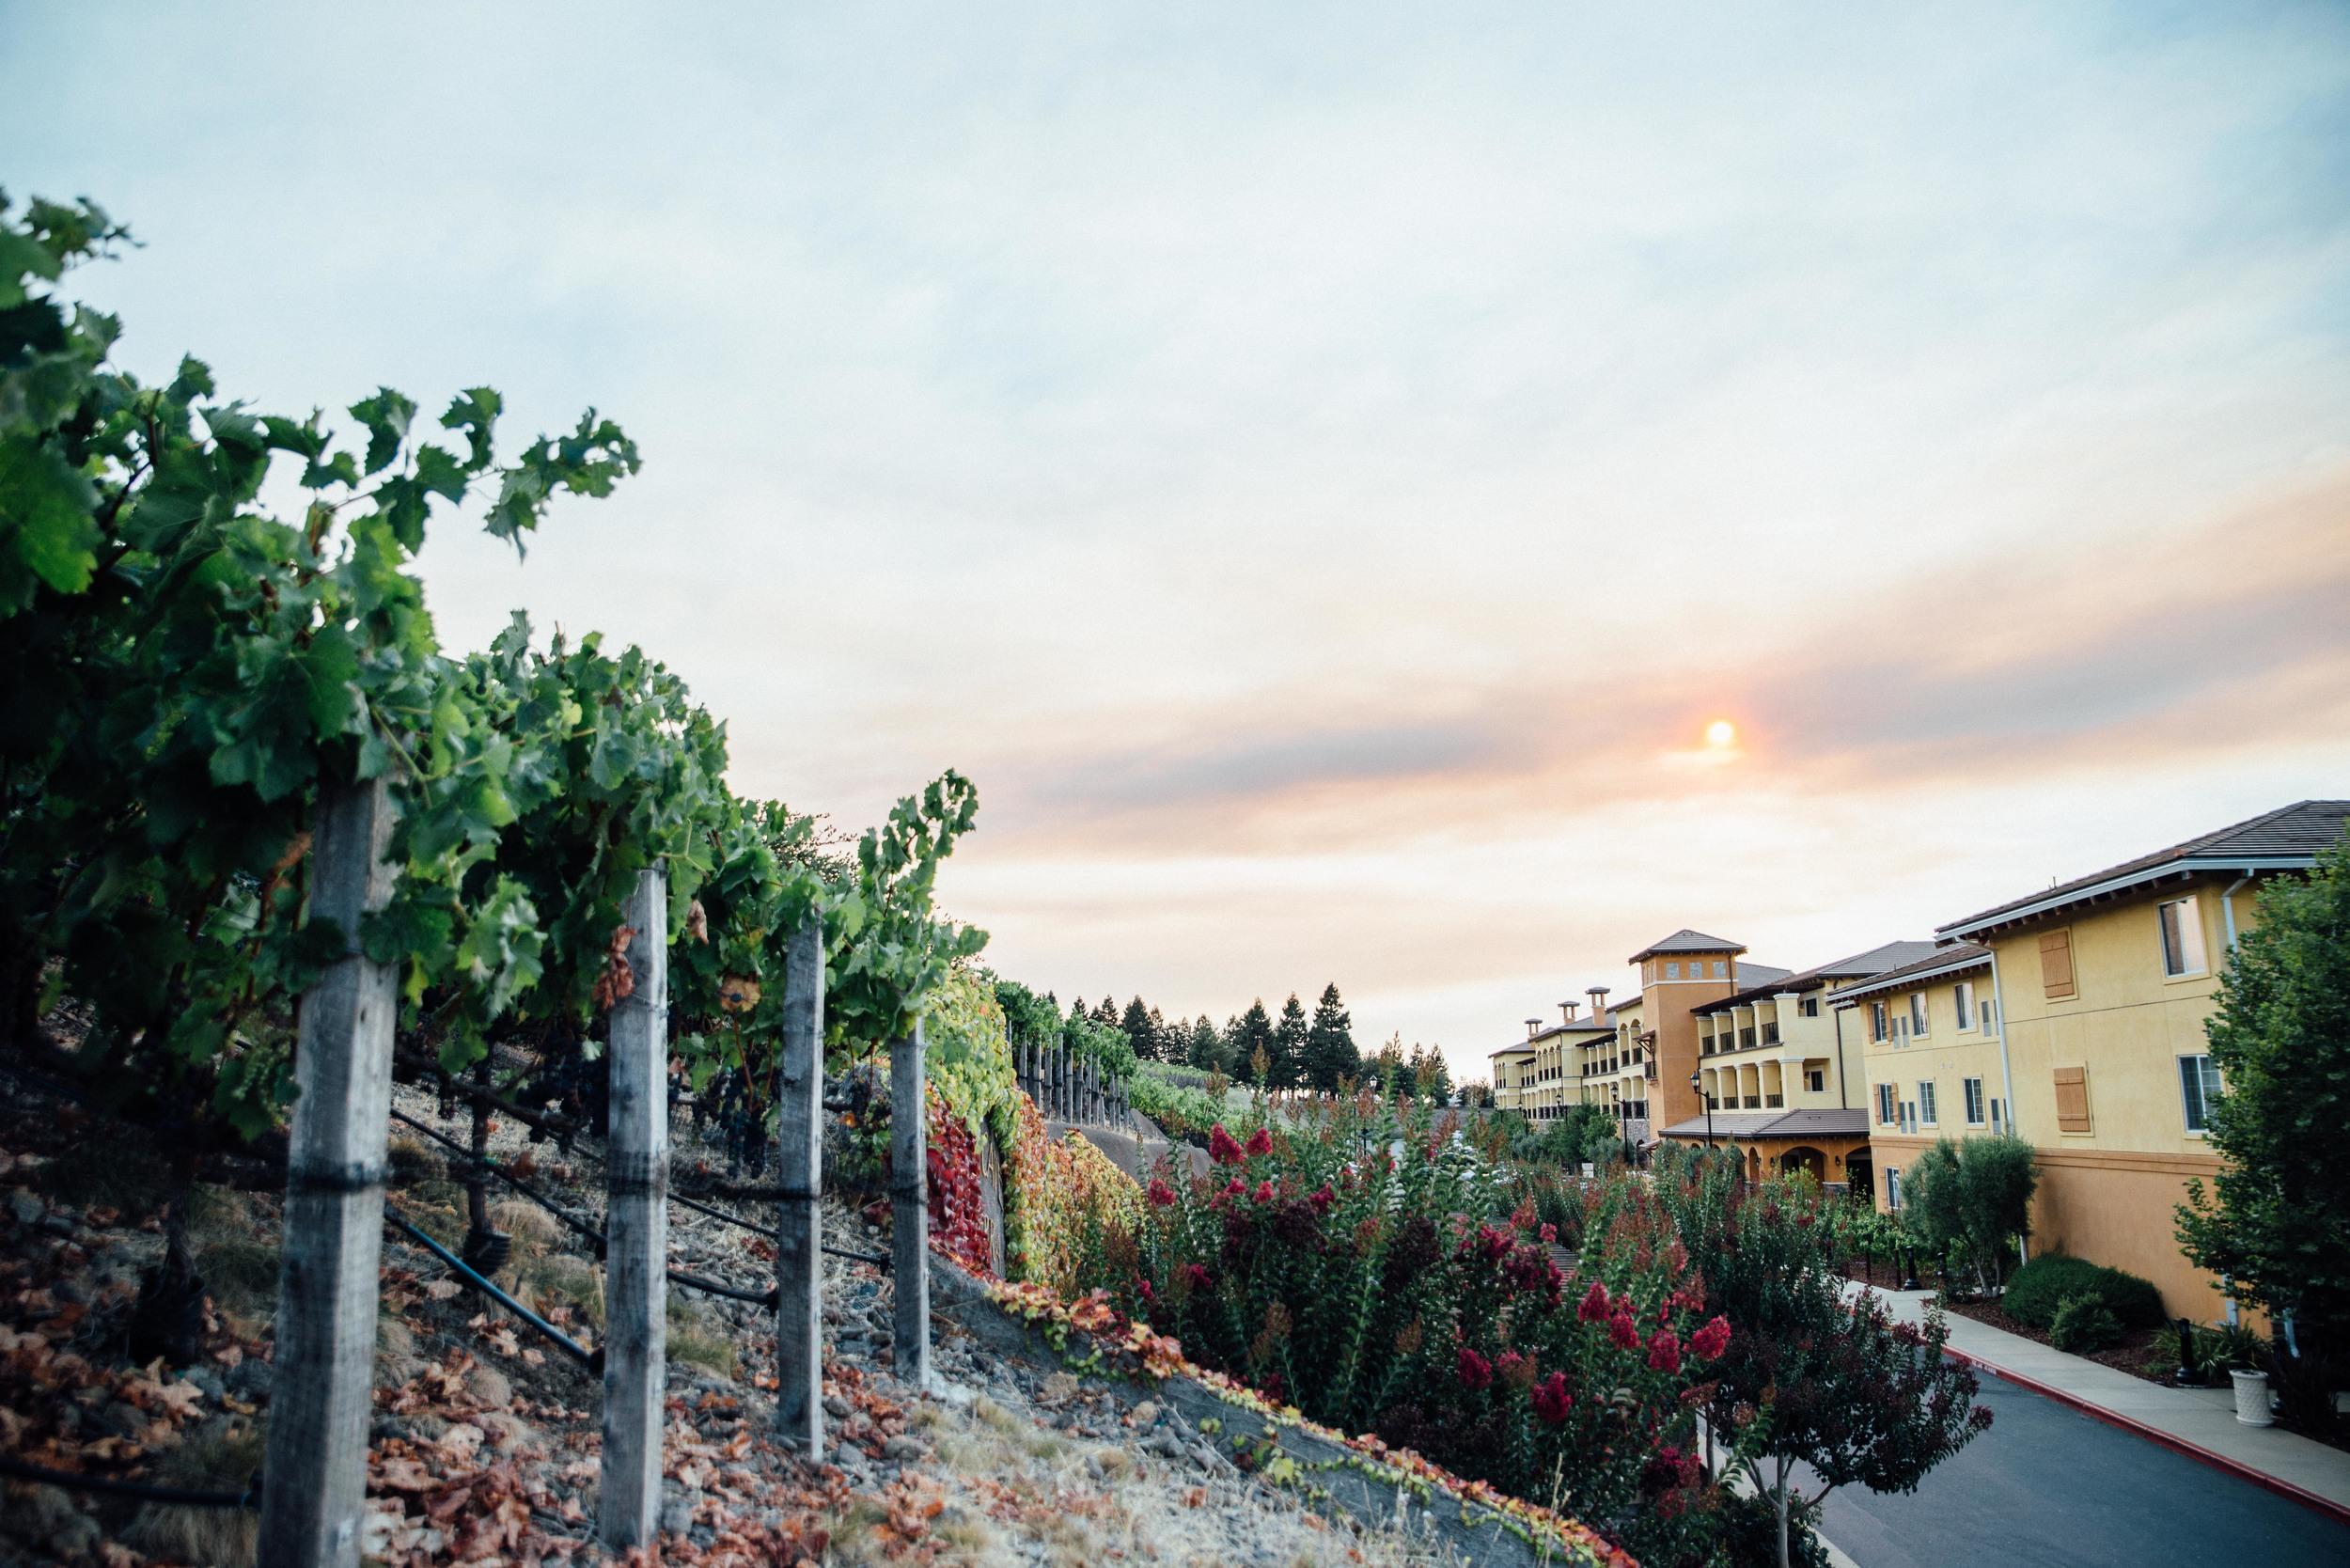 Vino Bello Resort, Napa, California